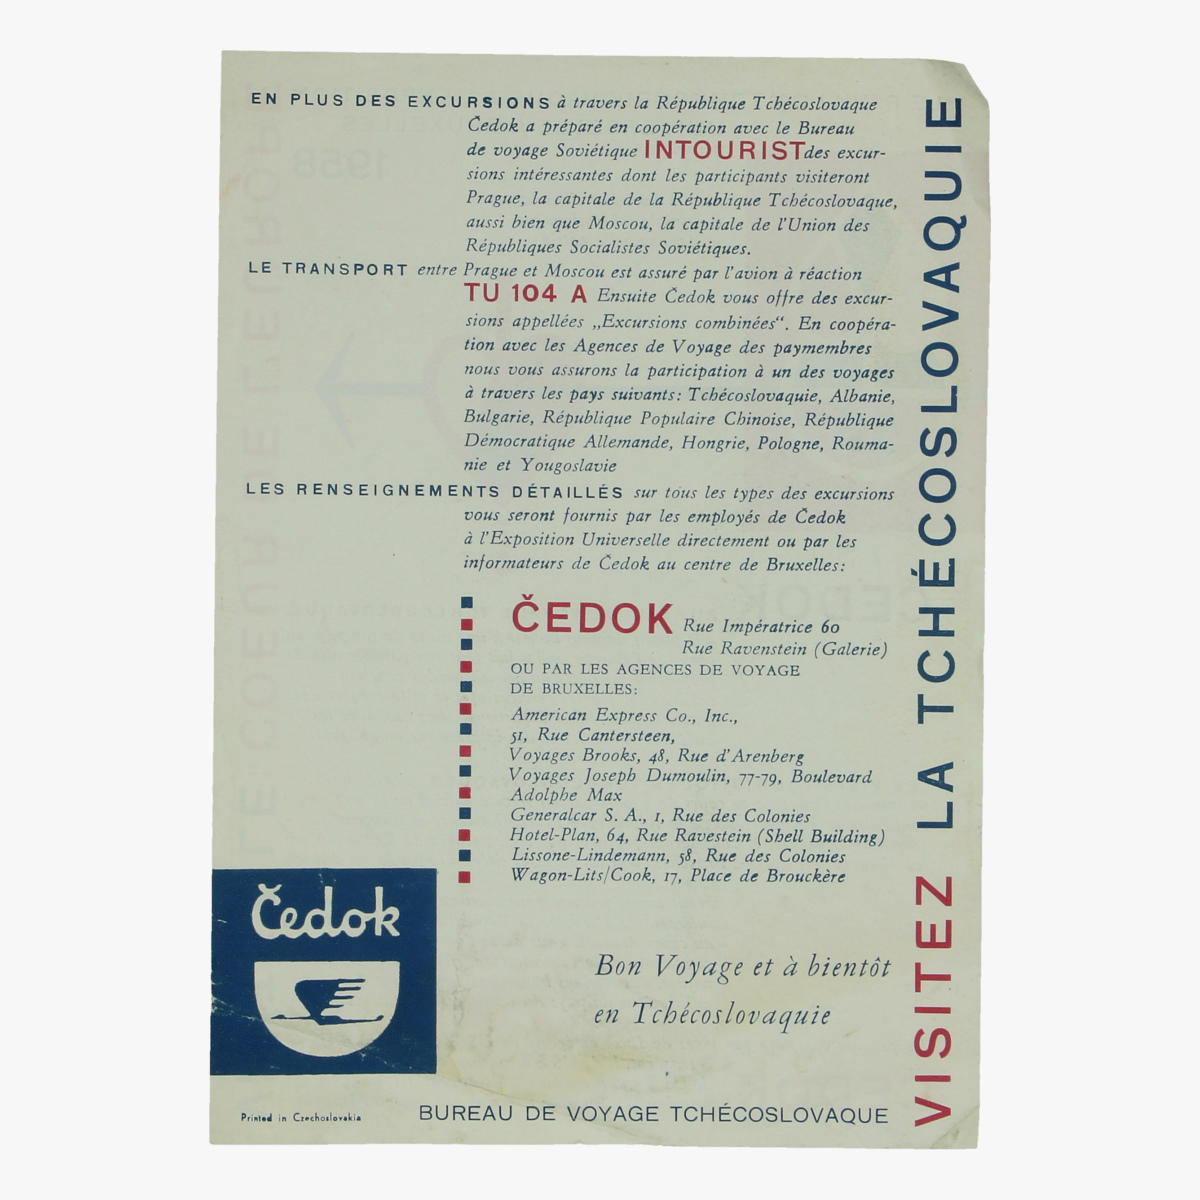 Afbeeldingen van expo 58 flyer le pavillon tchécoslovaque